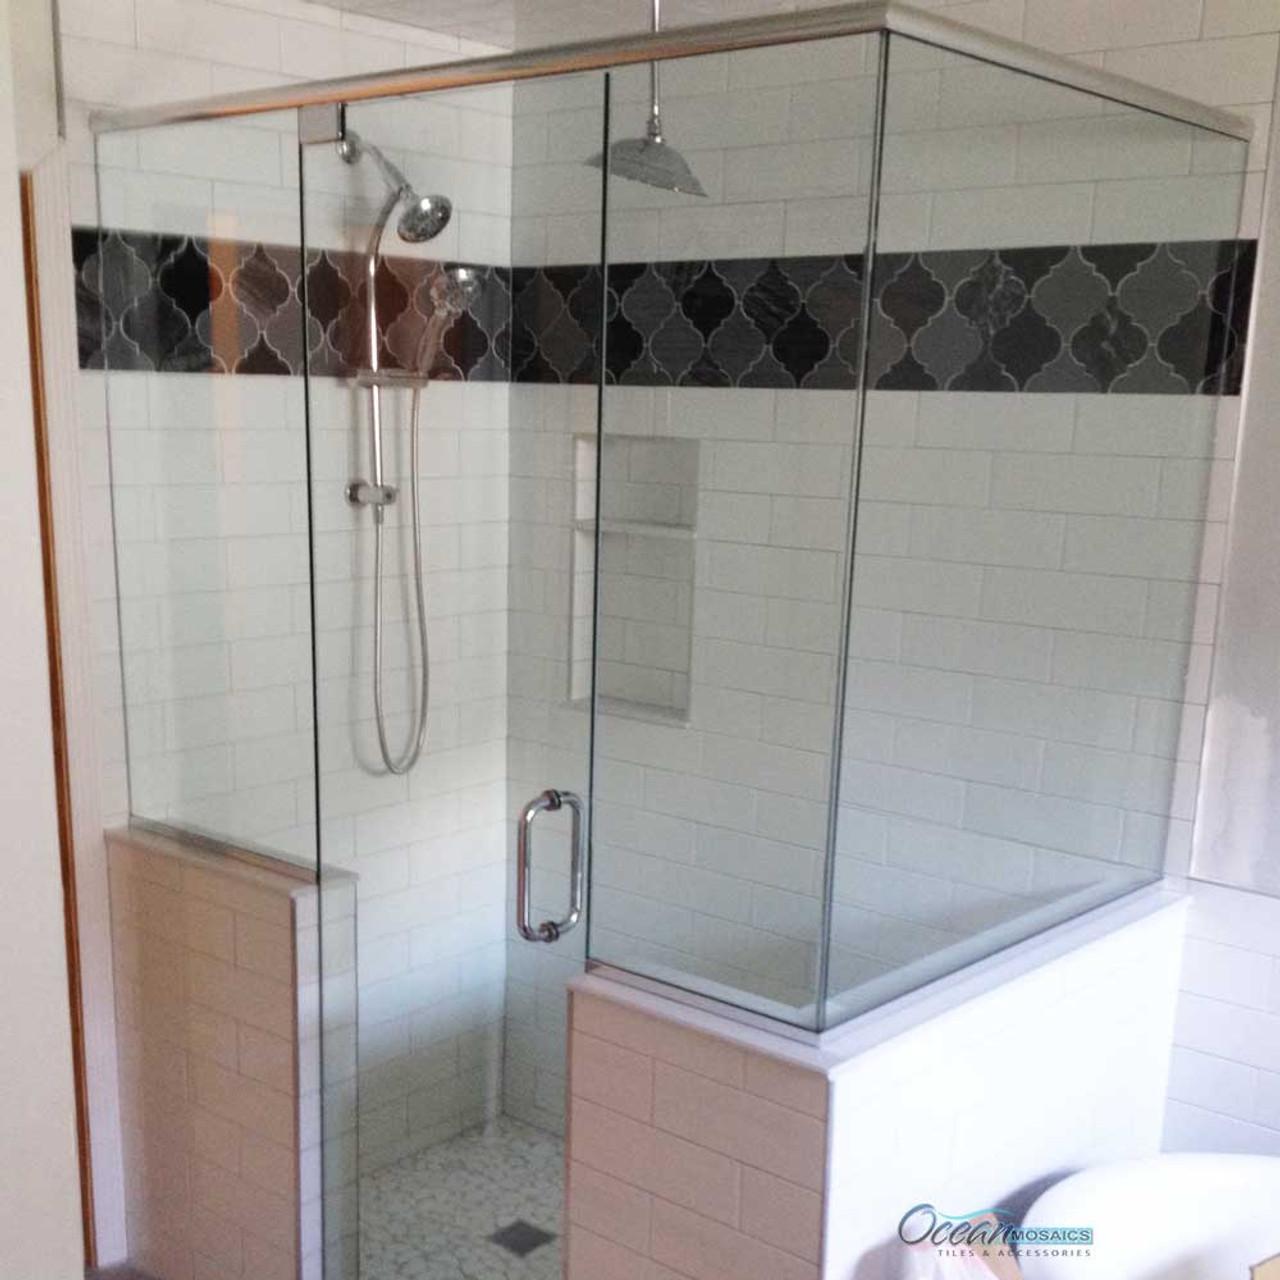 clover arabesque black mix mosaic glass tile